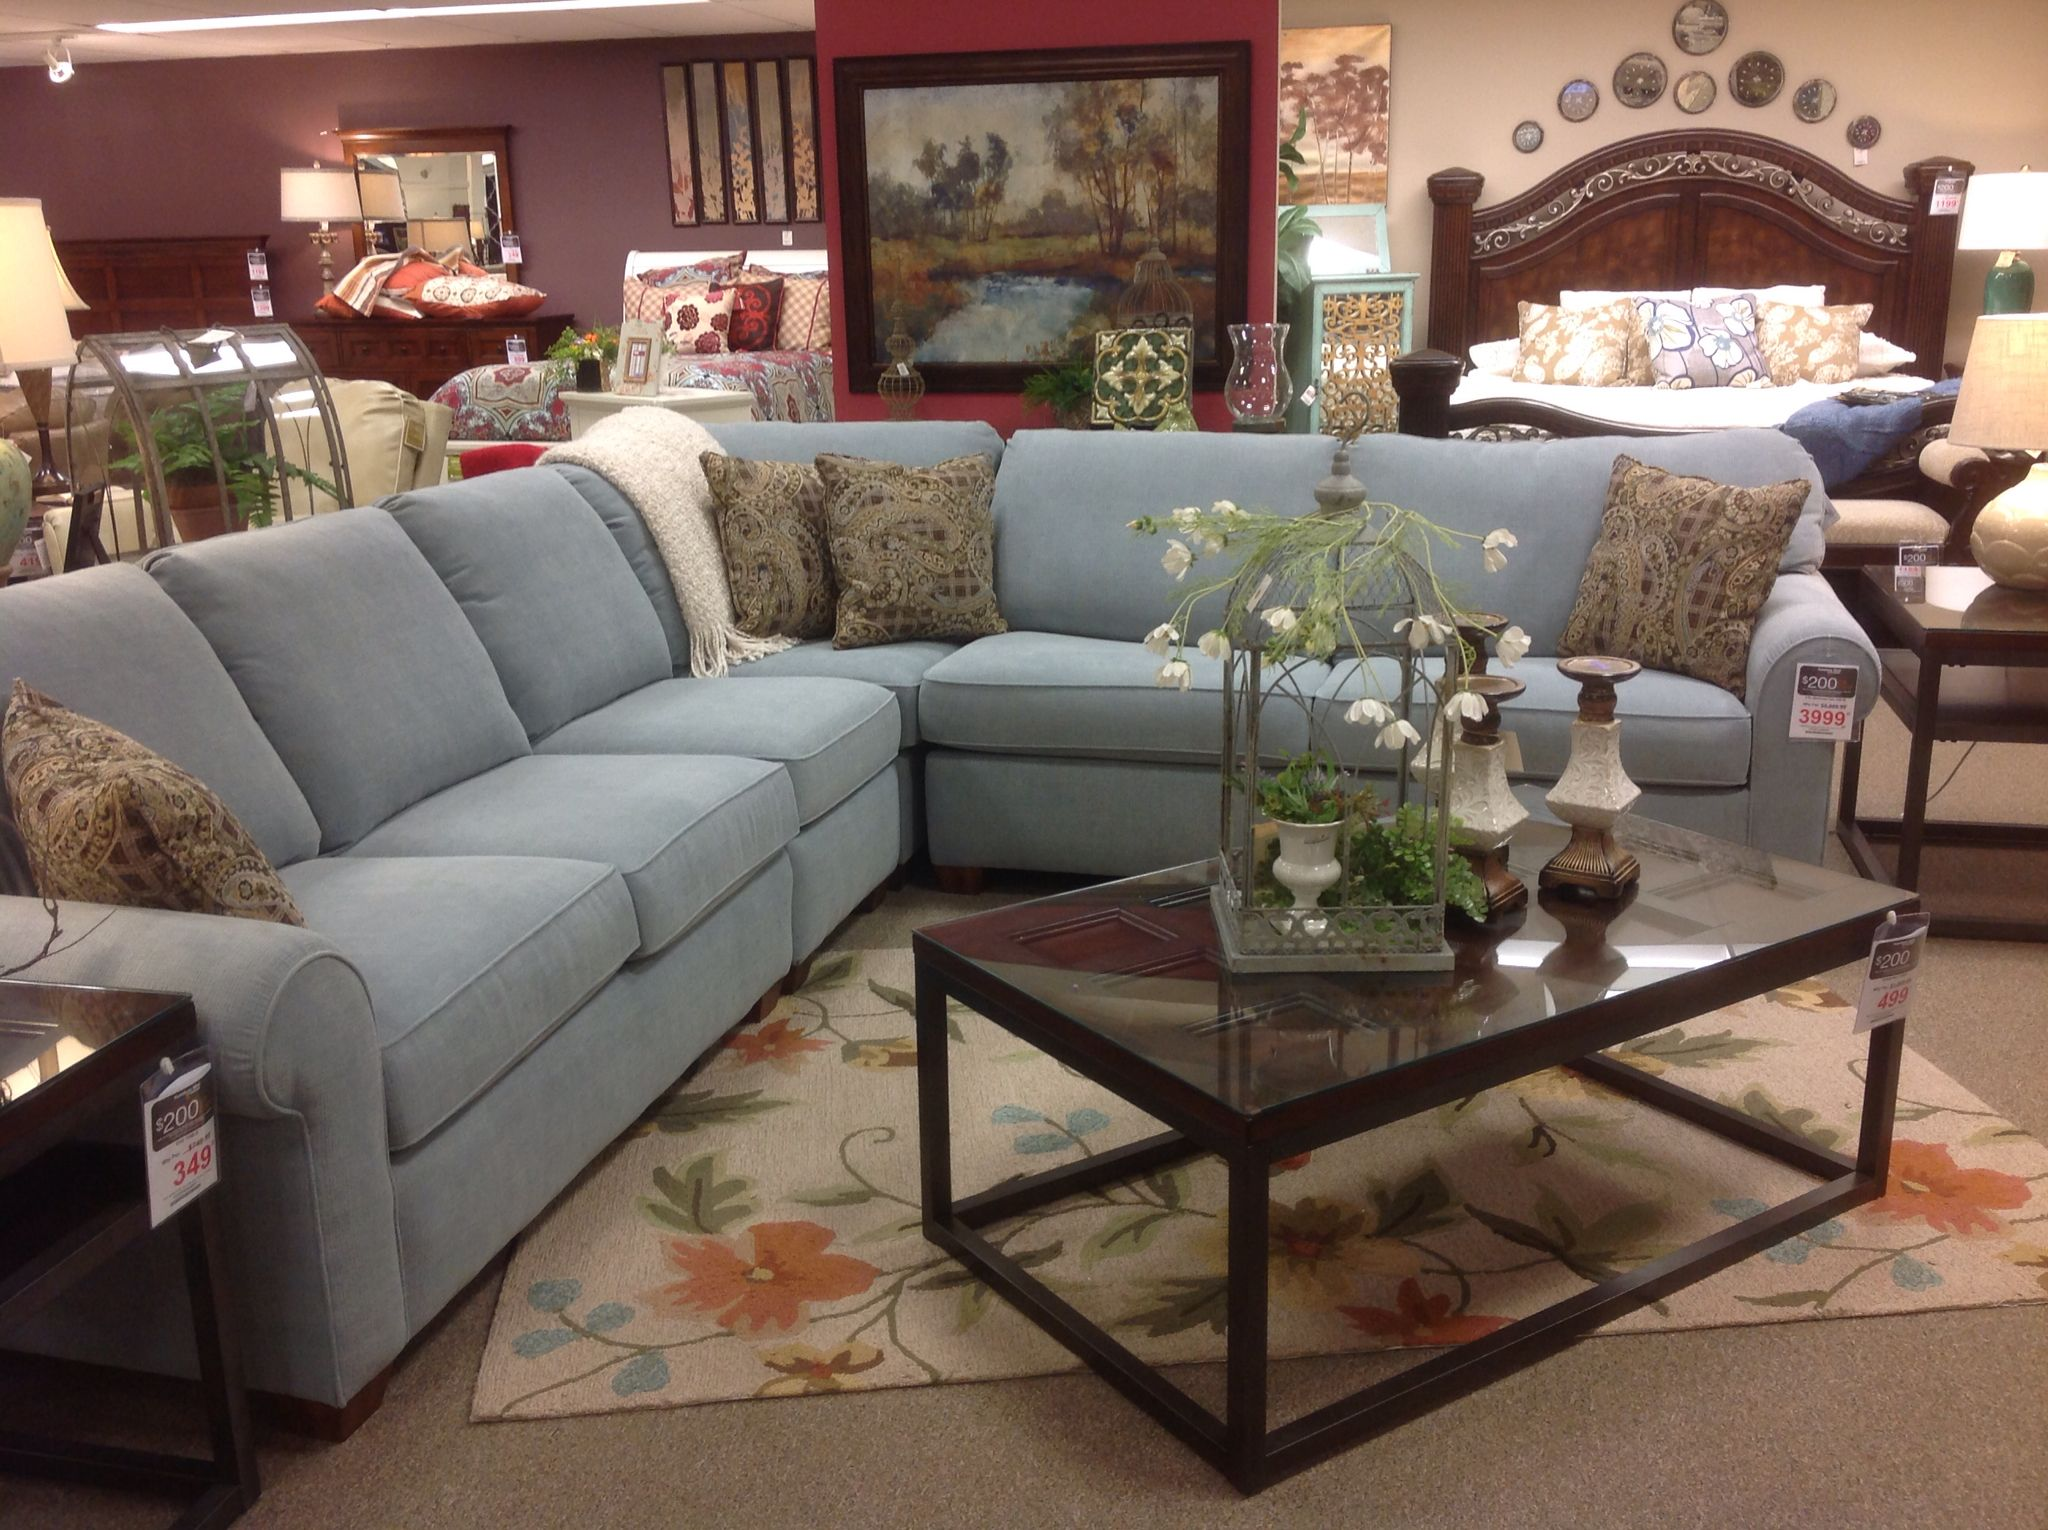 flexsteel sofa sets sofascore paris fc vs orleans s5535 sectional on showroom floor at